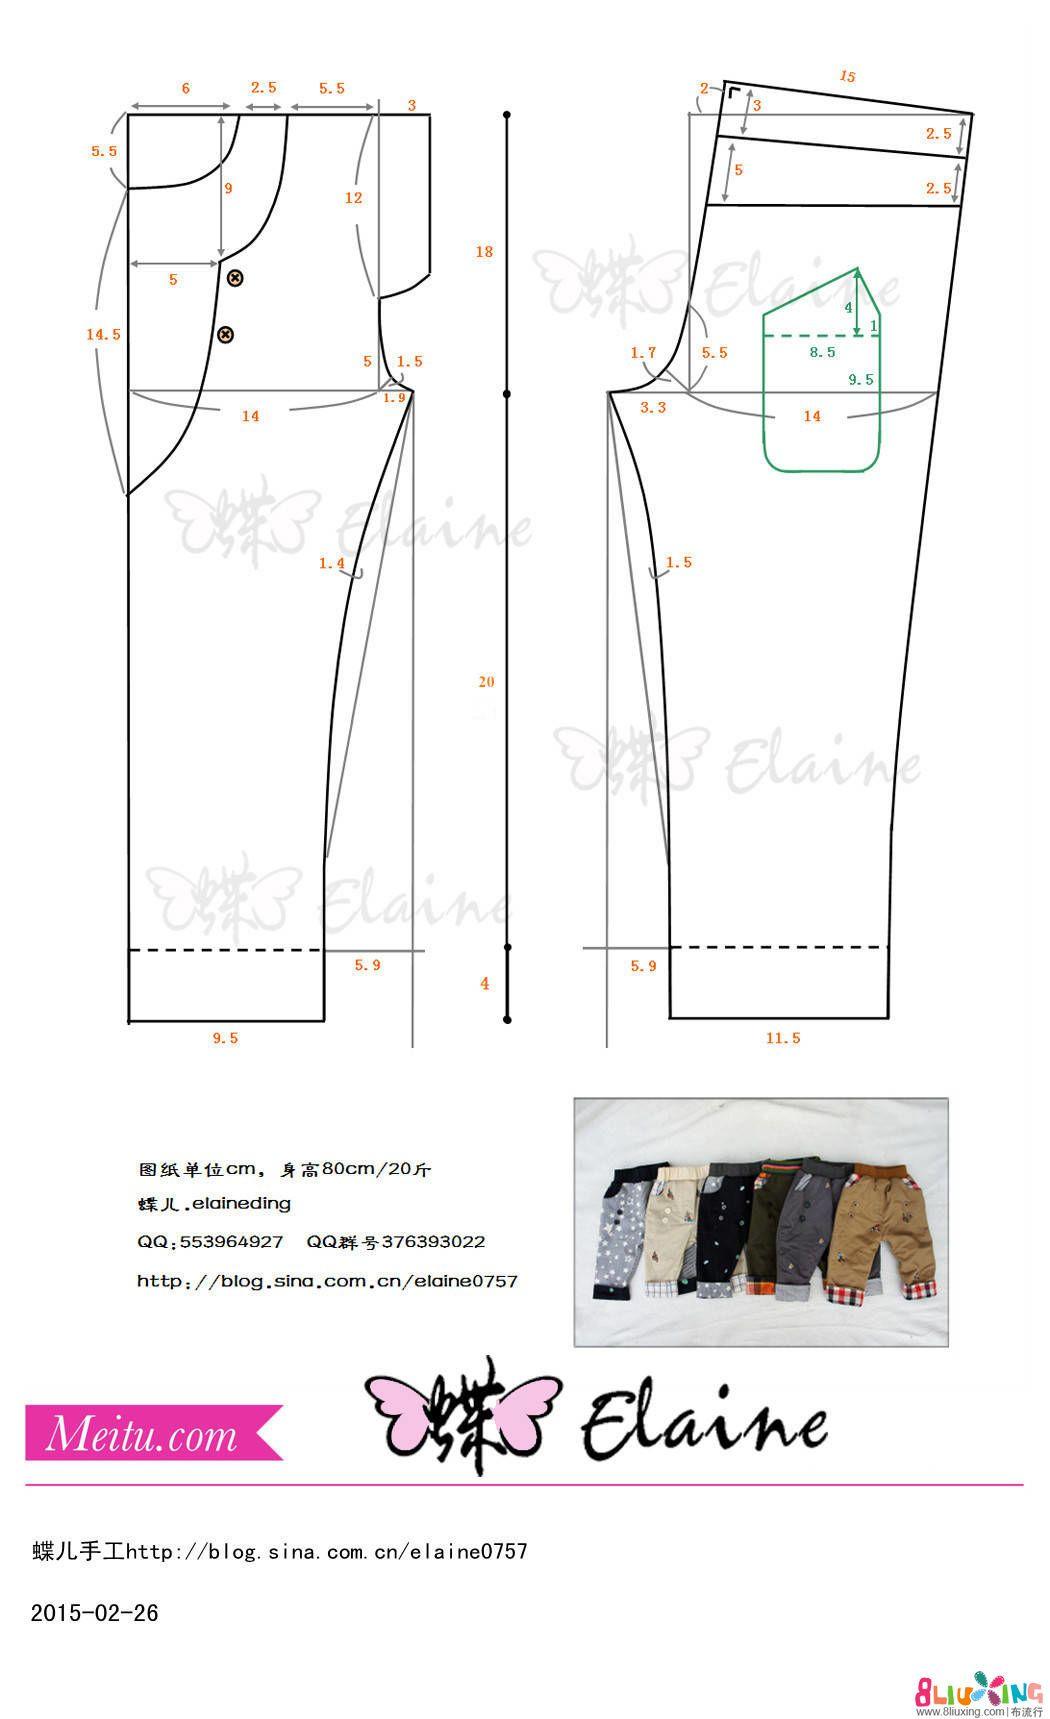 pants \\ 80cm | me gusta la costura | Pinterest | Patrones, Costura y ...